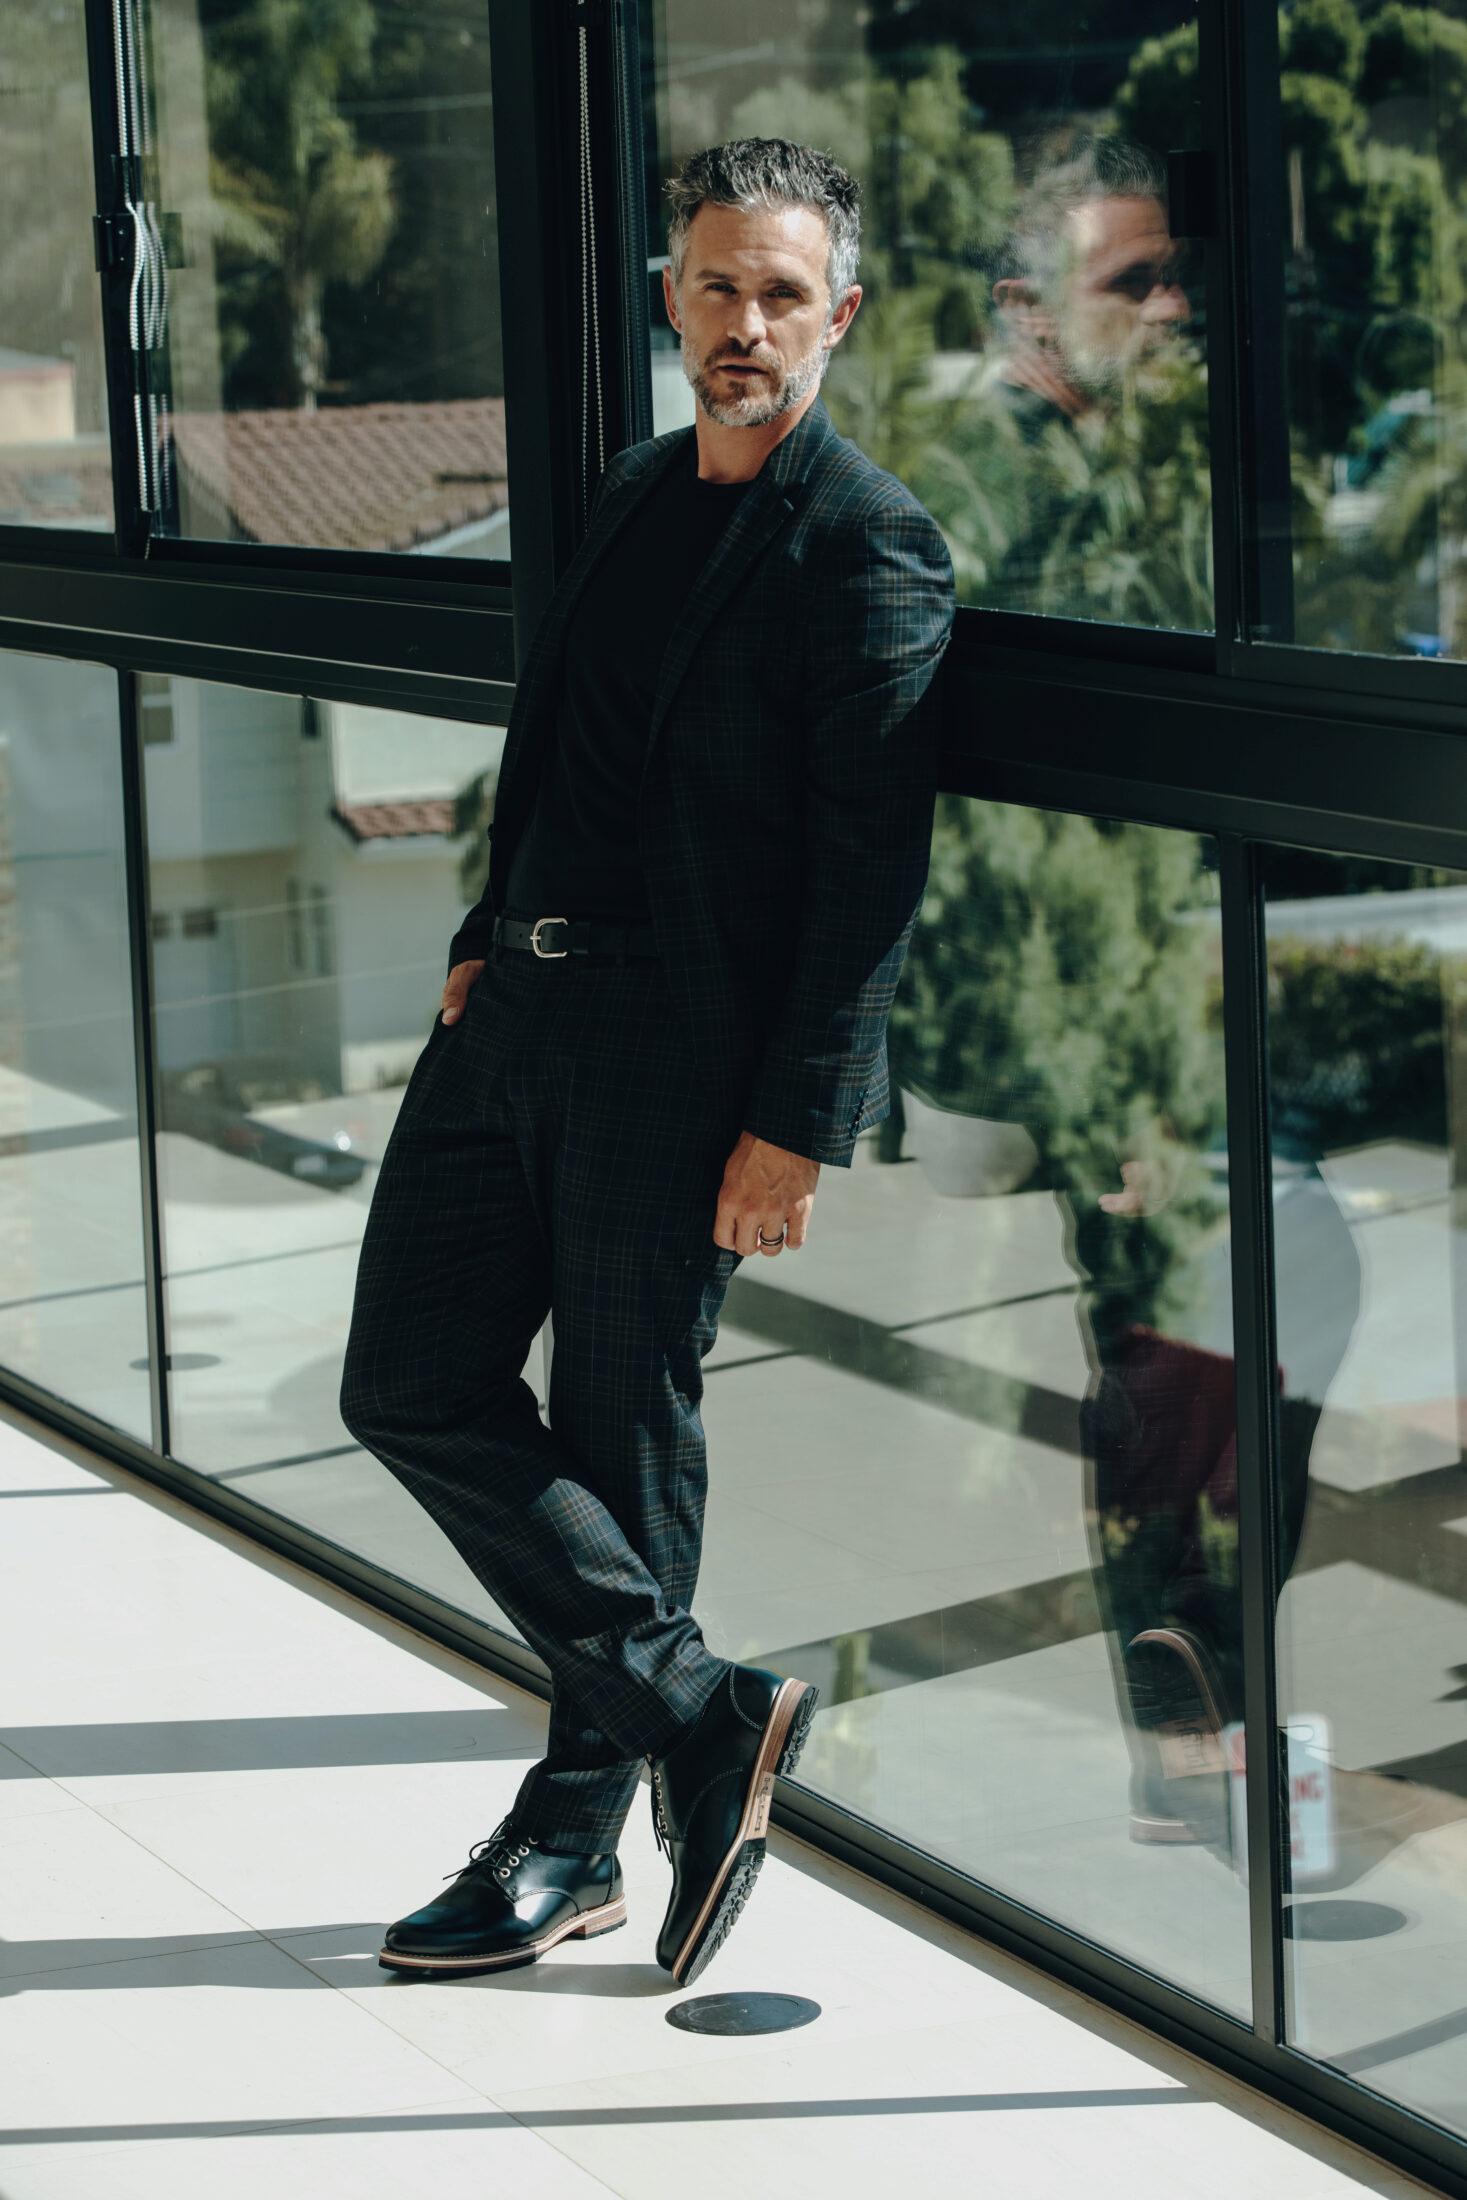 The Nils Black being worn